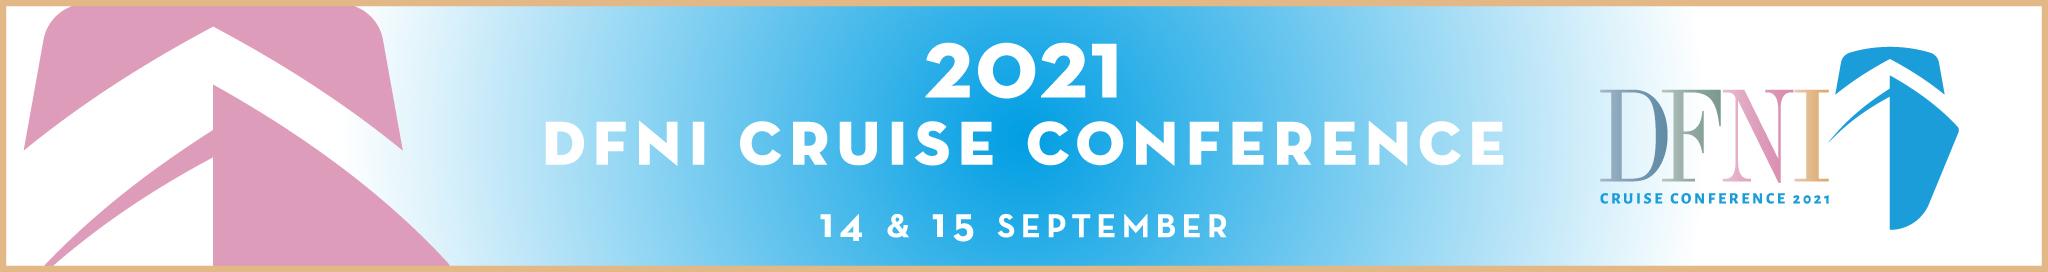 2020 DFNI Cruise Conference main